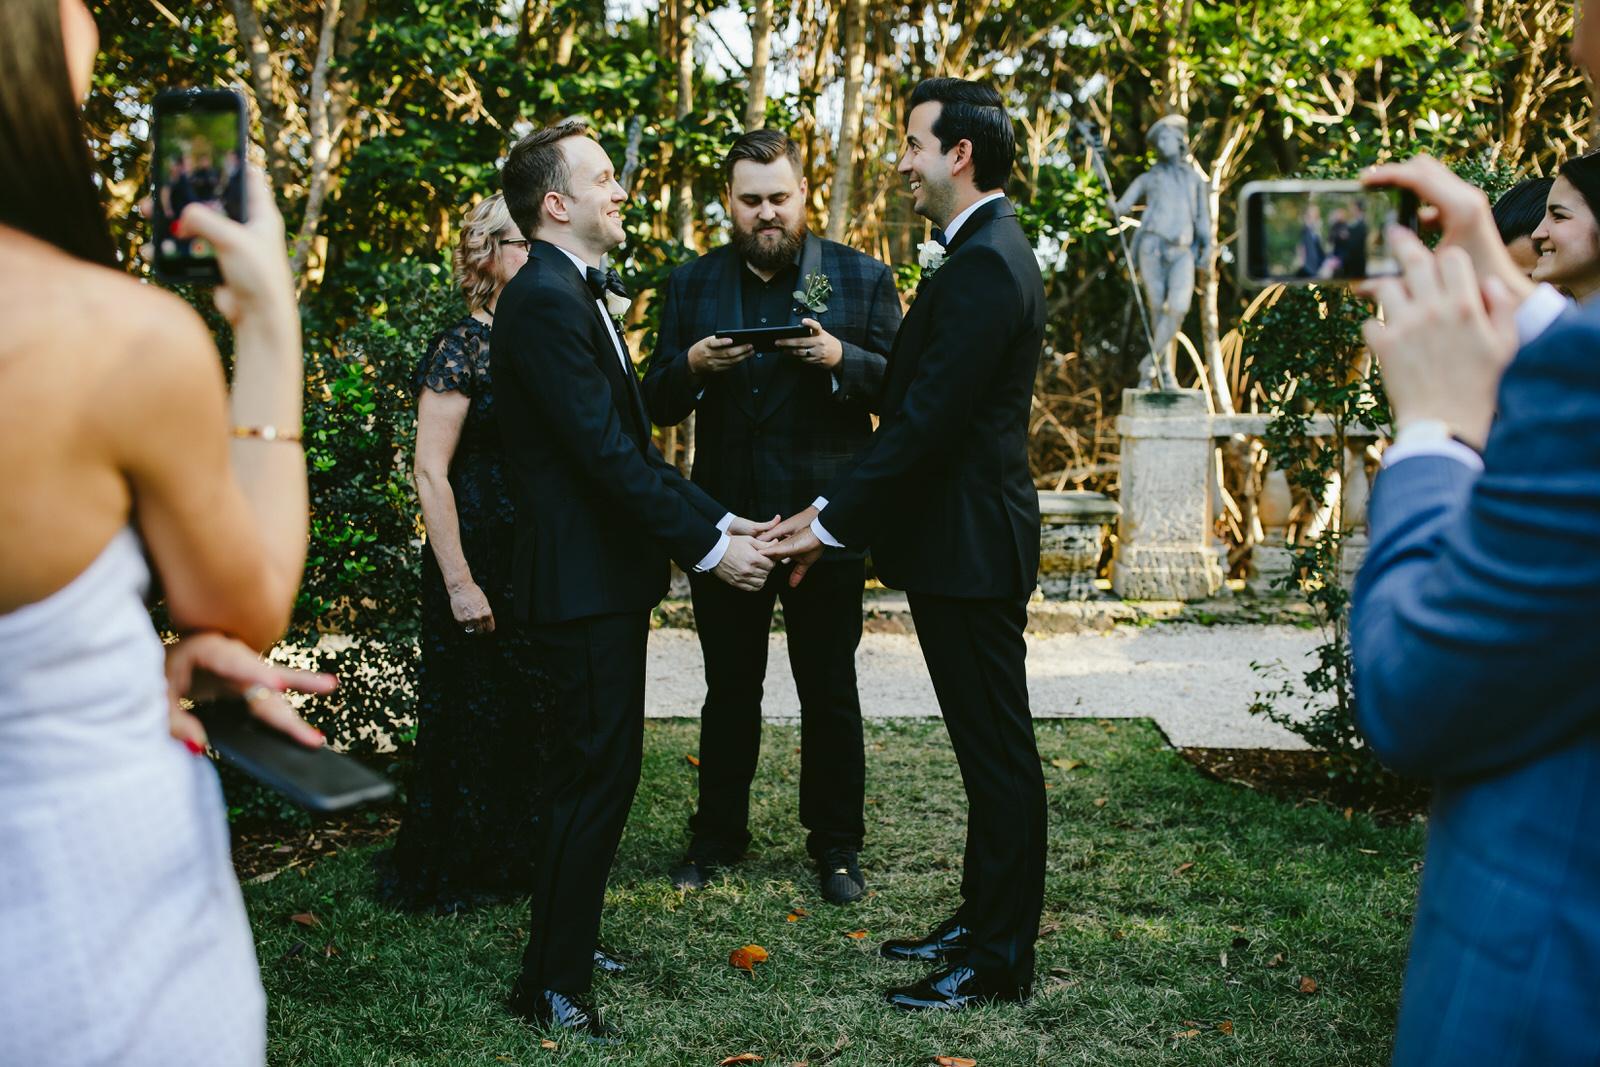 vizcaya_elopement_intimate_wedding_ceremony-23.jpg